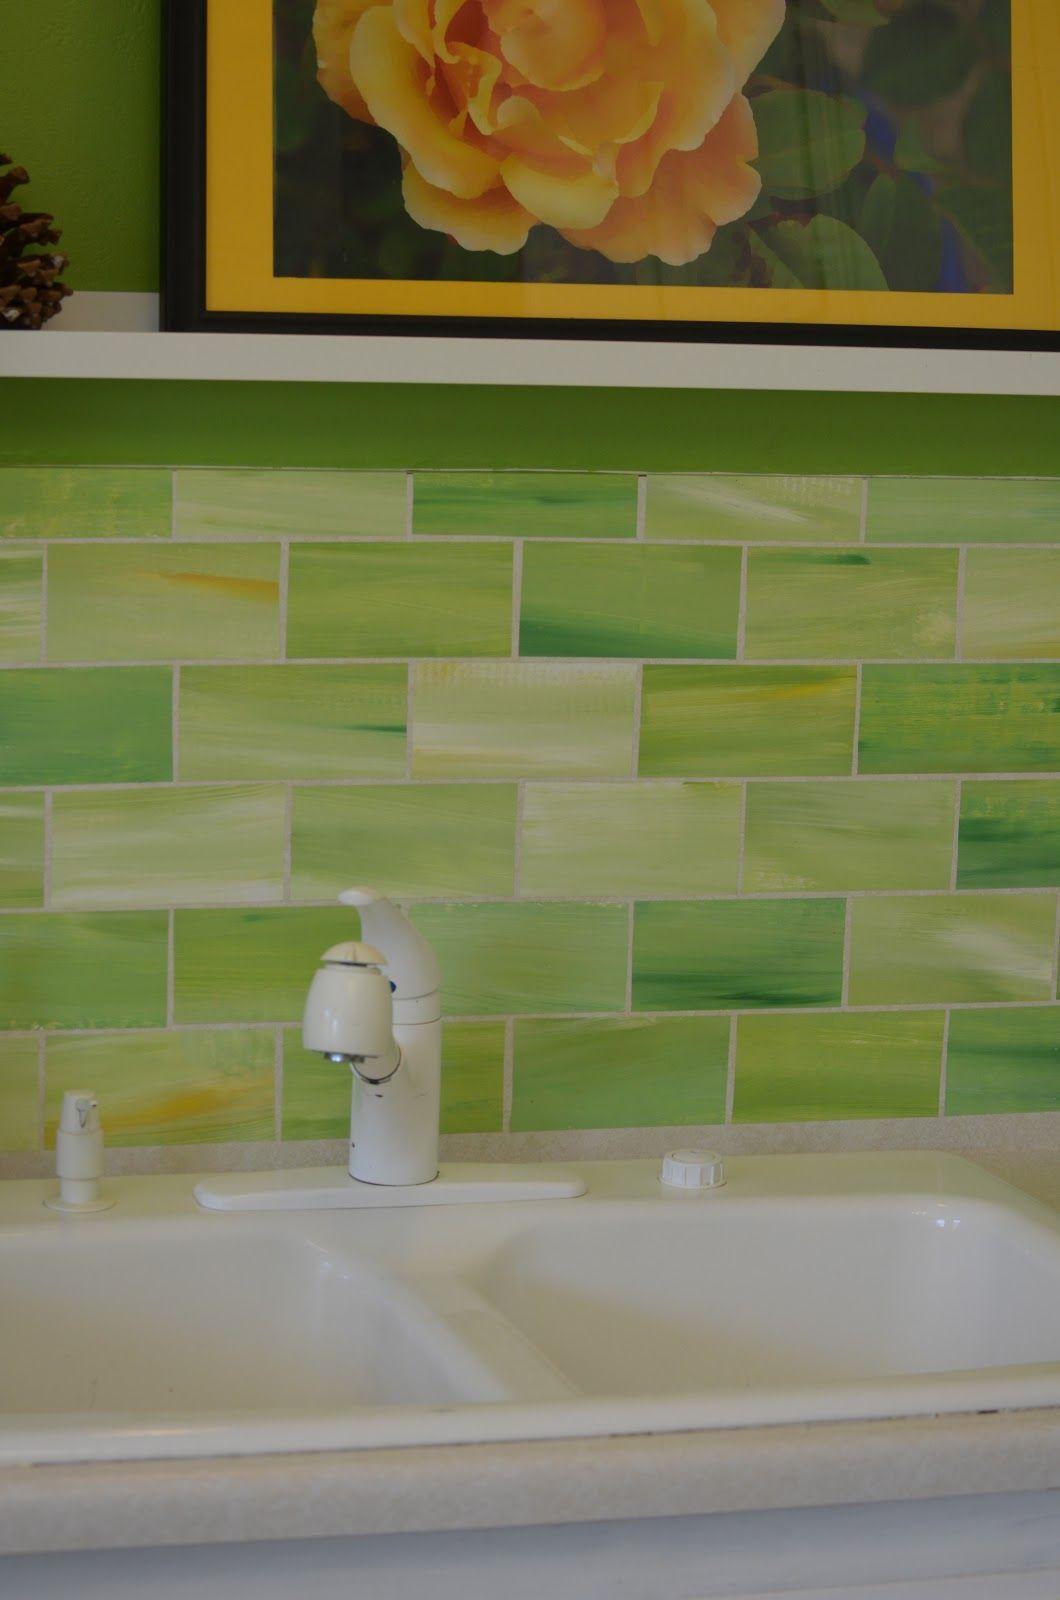 Green glass backsplash tile